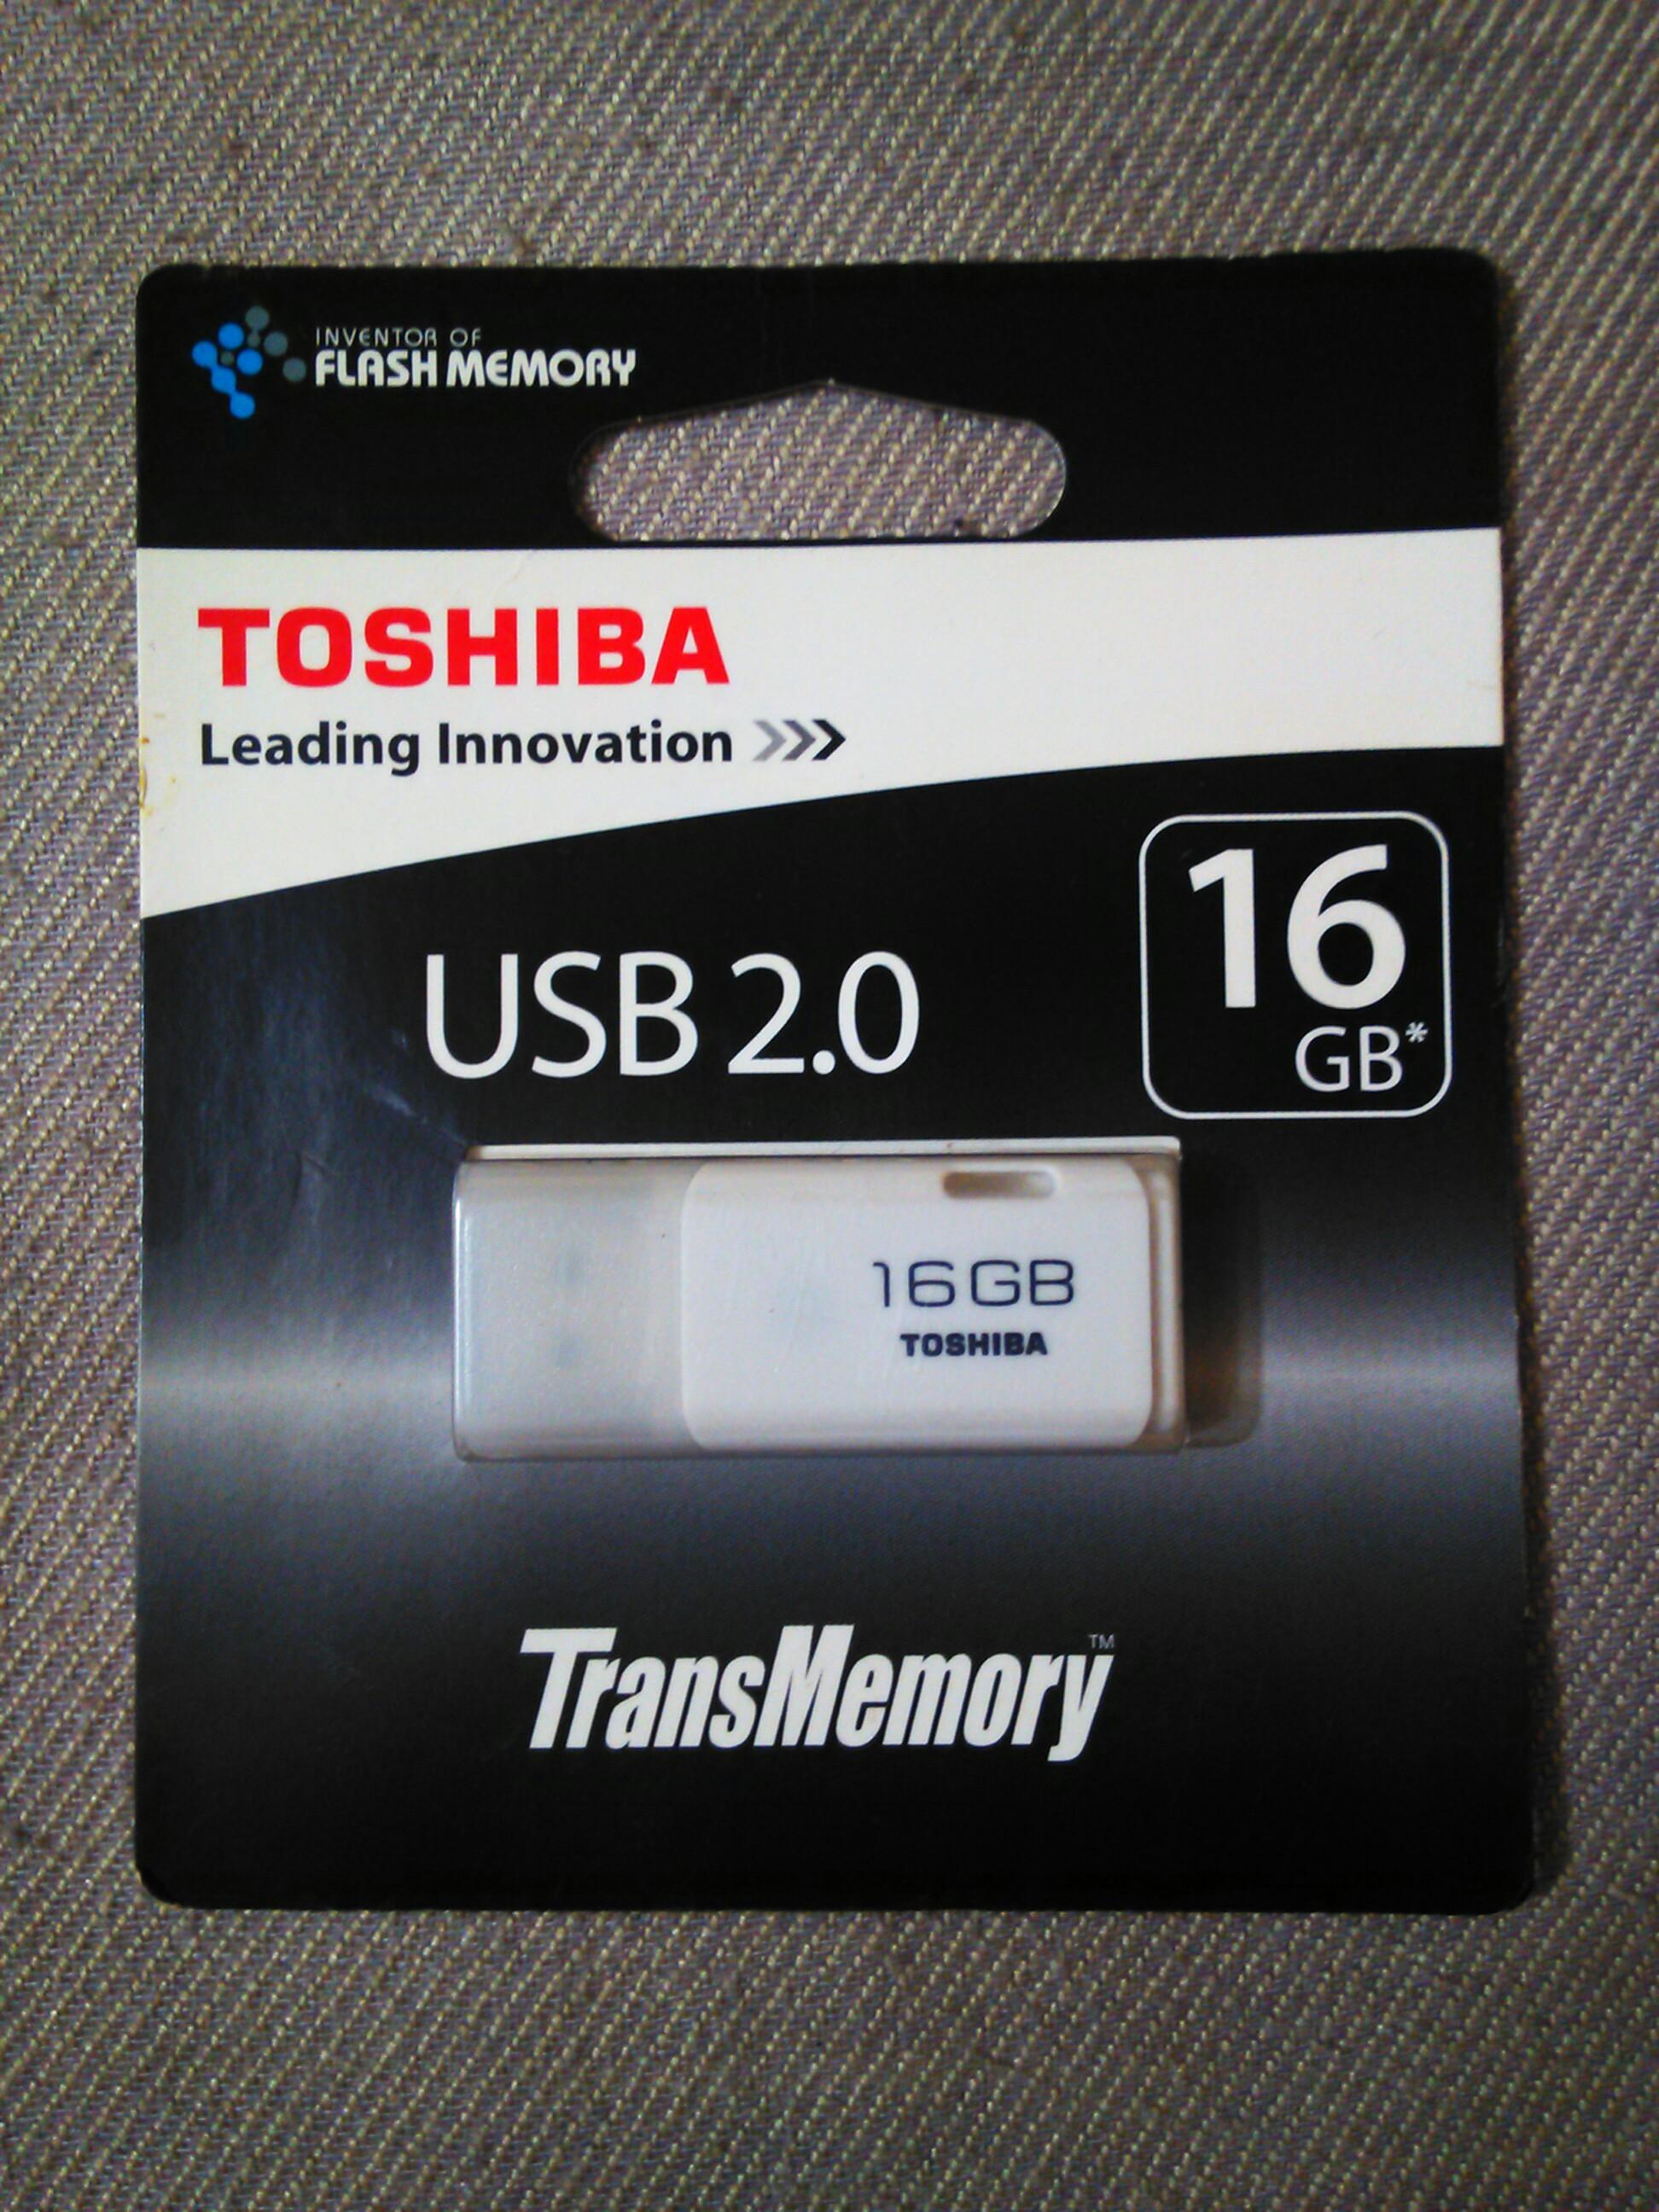 Toshiba 16GB white flashdrive (USB 2.0)